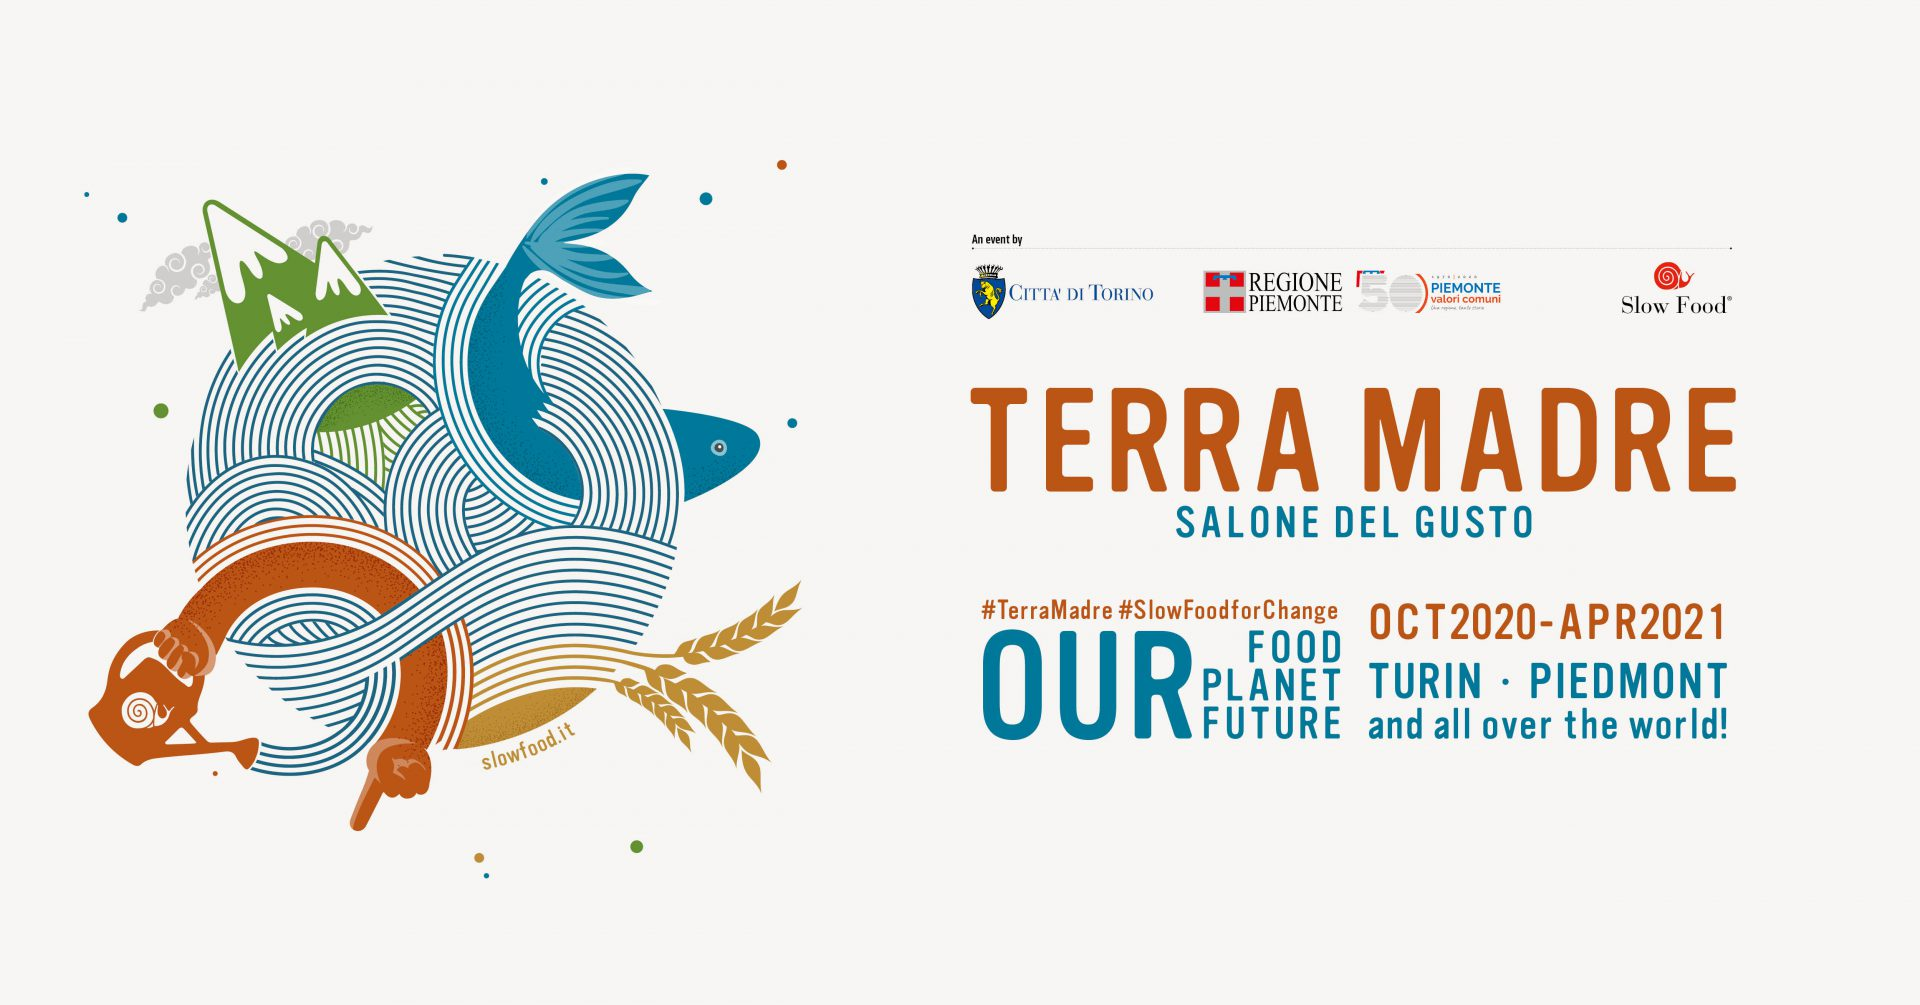 FB Cover_Terra Madre Salone del Gusto 2020 - door SF International